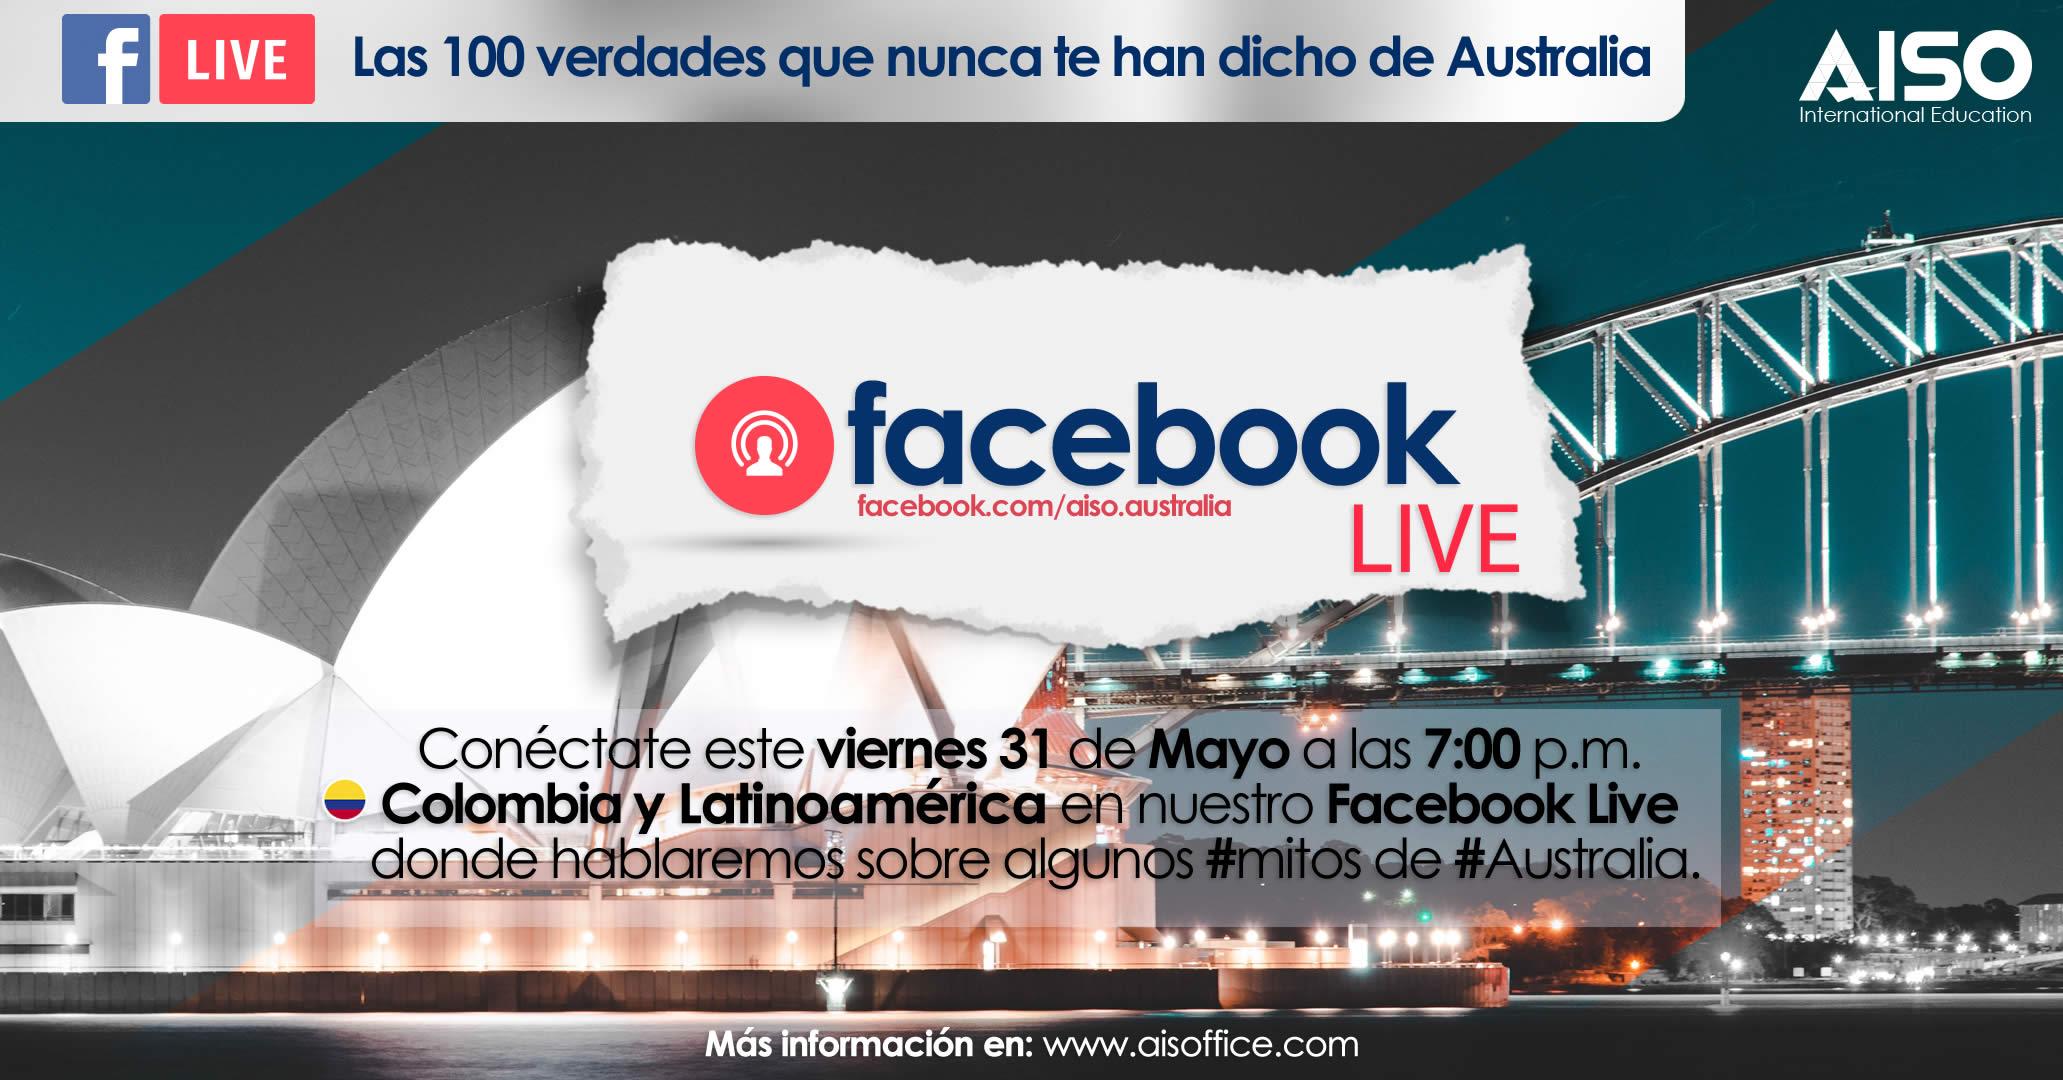 FaceBook Live 100 verdades sobre Australia